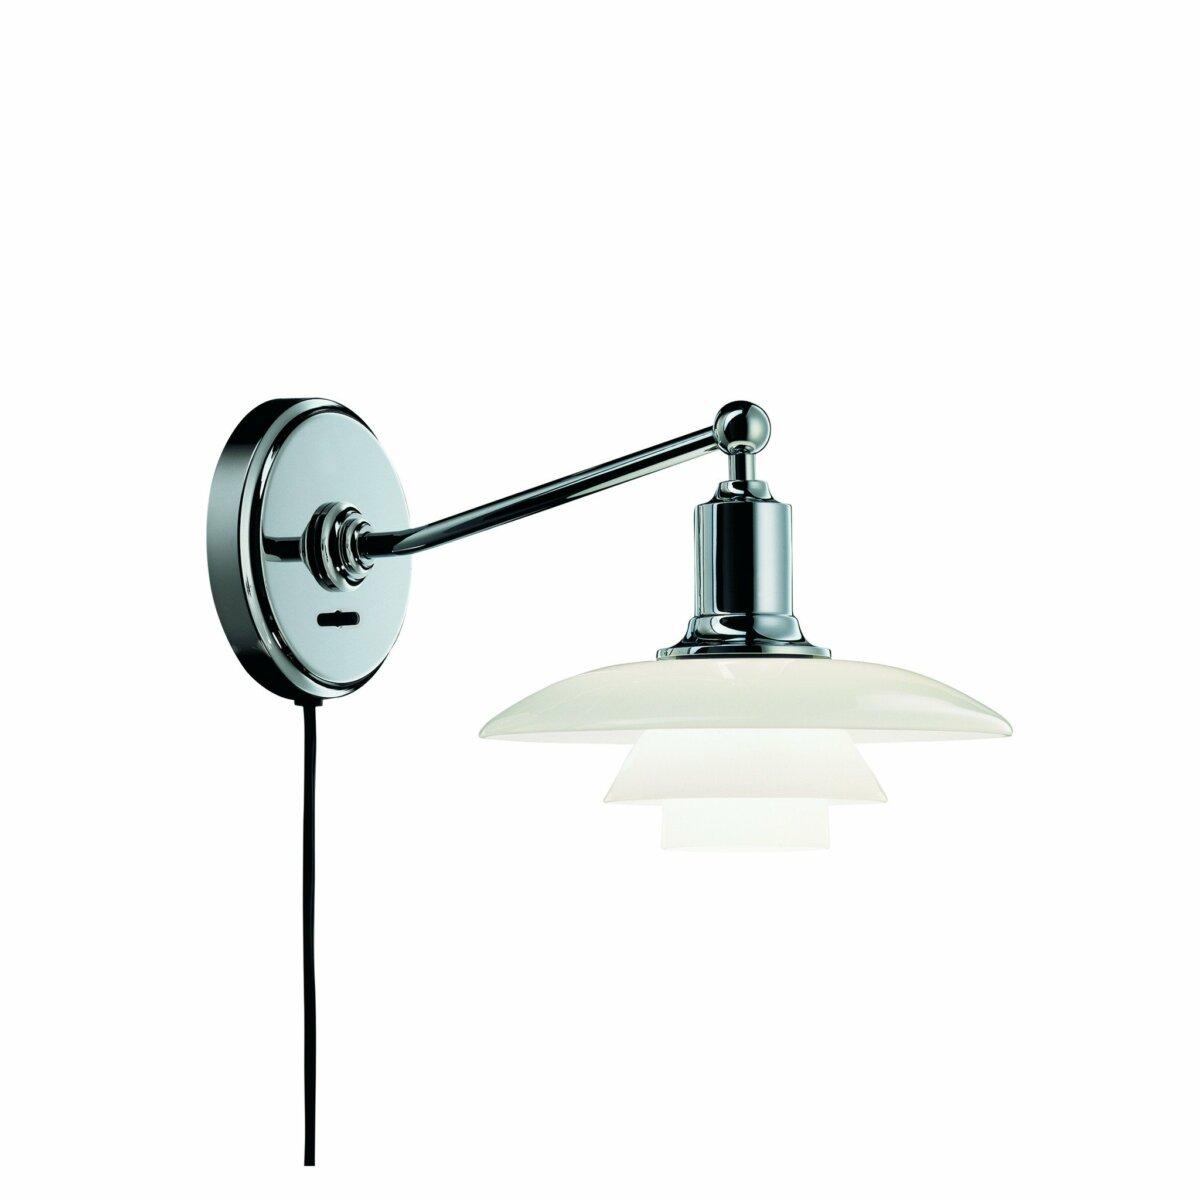 Poulsen lampa ścienna PH 2/1 WALL